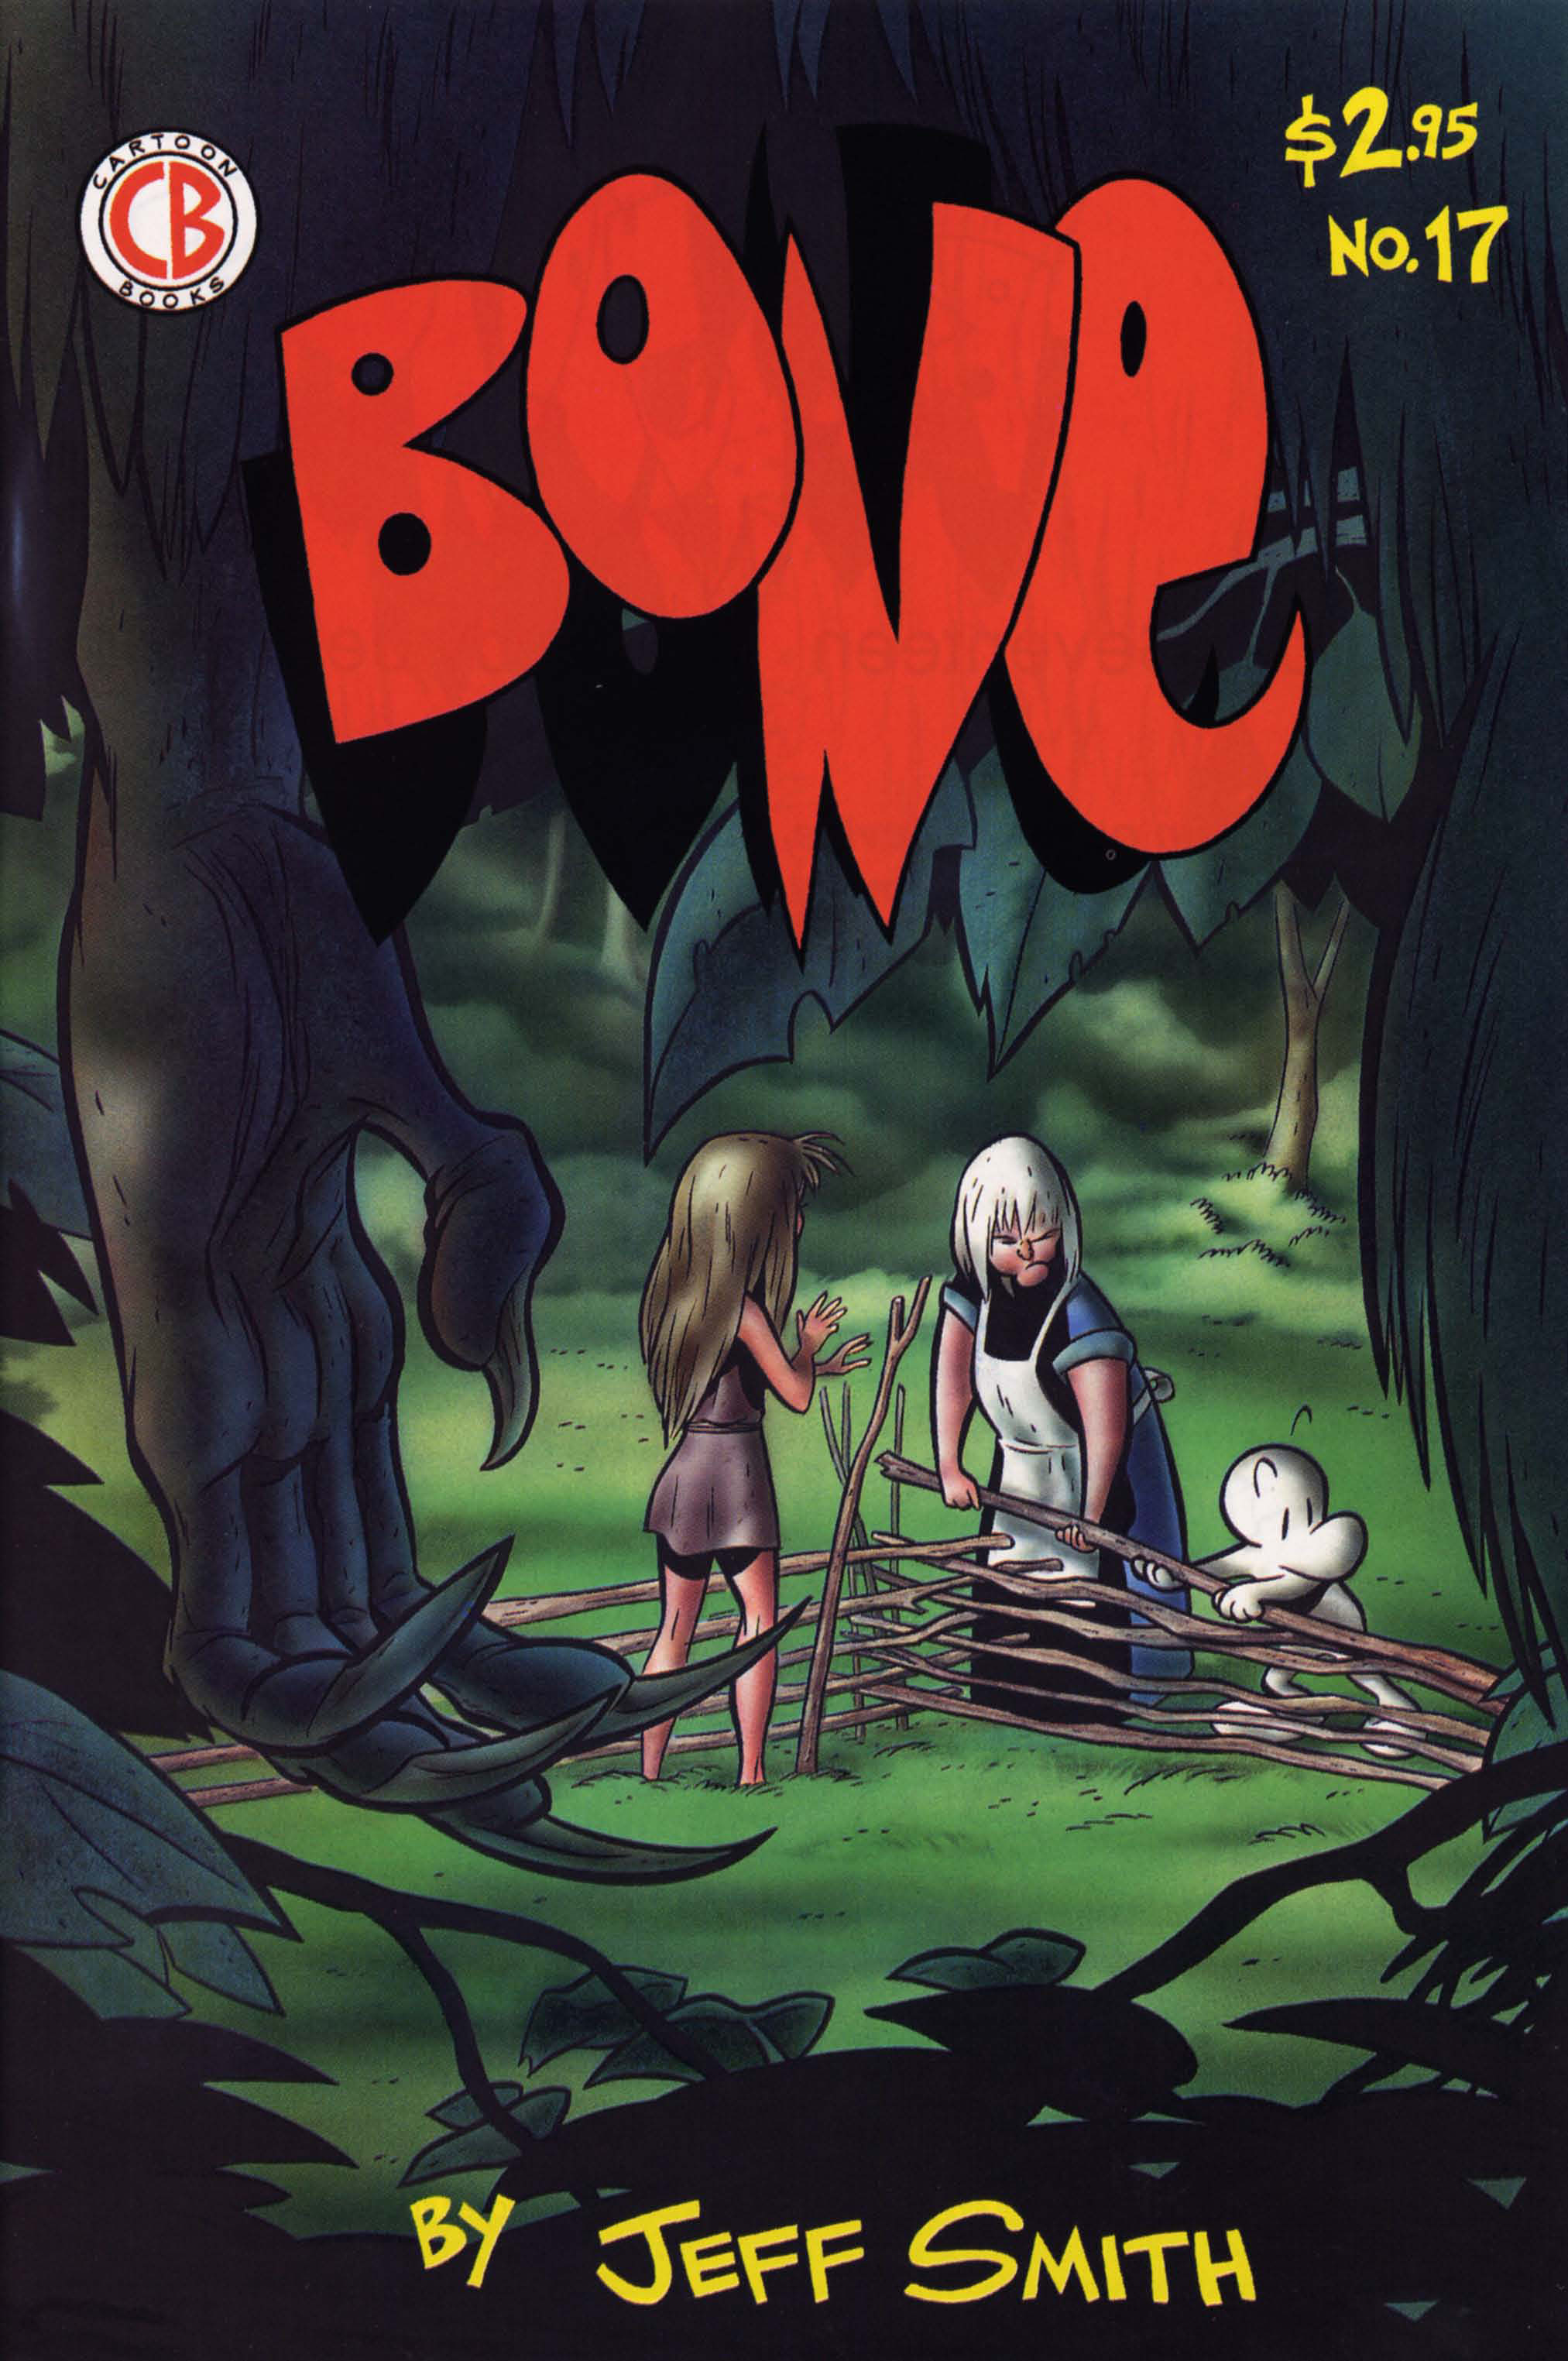 Bone 1991 Issue 17